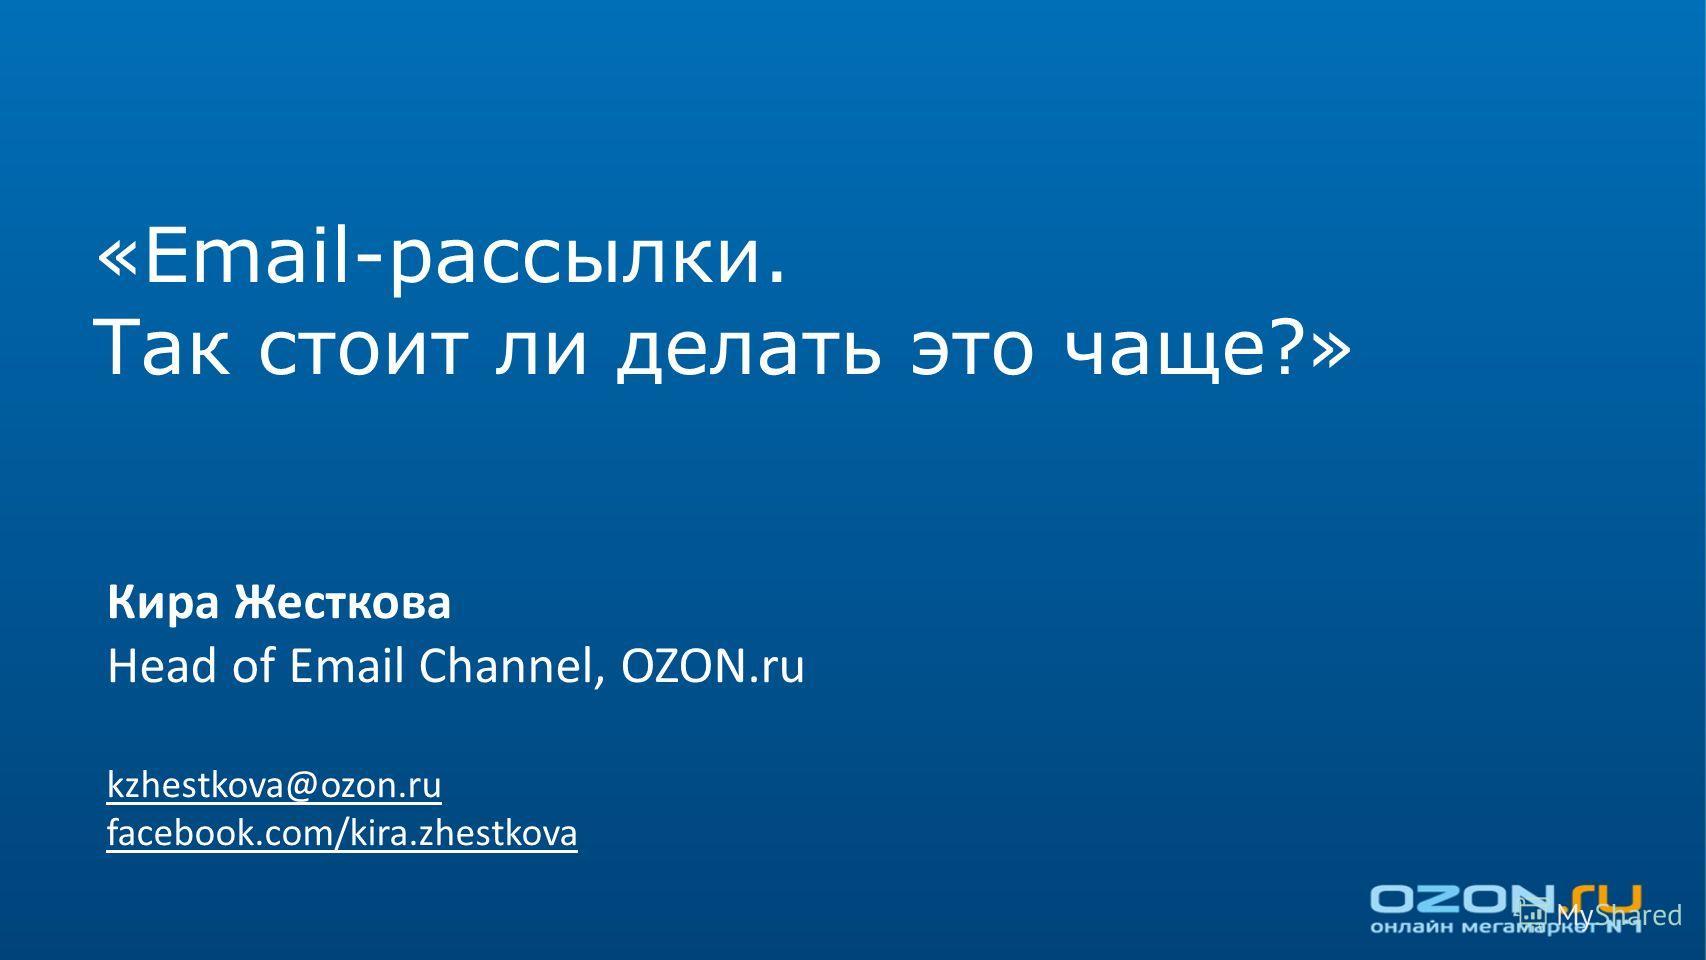 «Email-рассылки. Так стоит ли делать это чаще?» Кира Жесткова Head of Email Channel, OZON.ru kzhestkova@ozon.ru facebook.com/kira.zhestkova